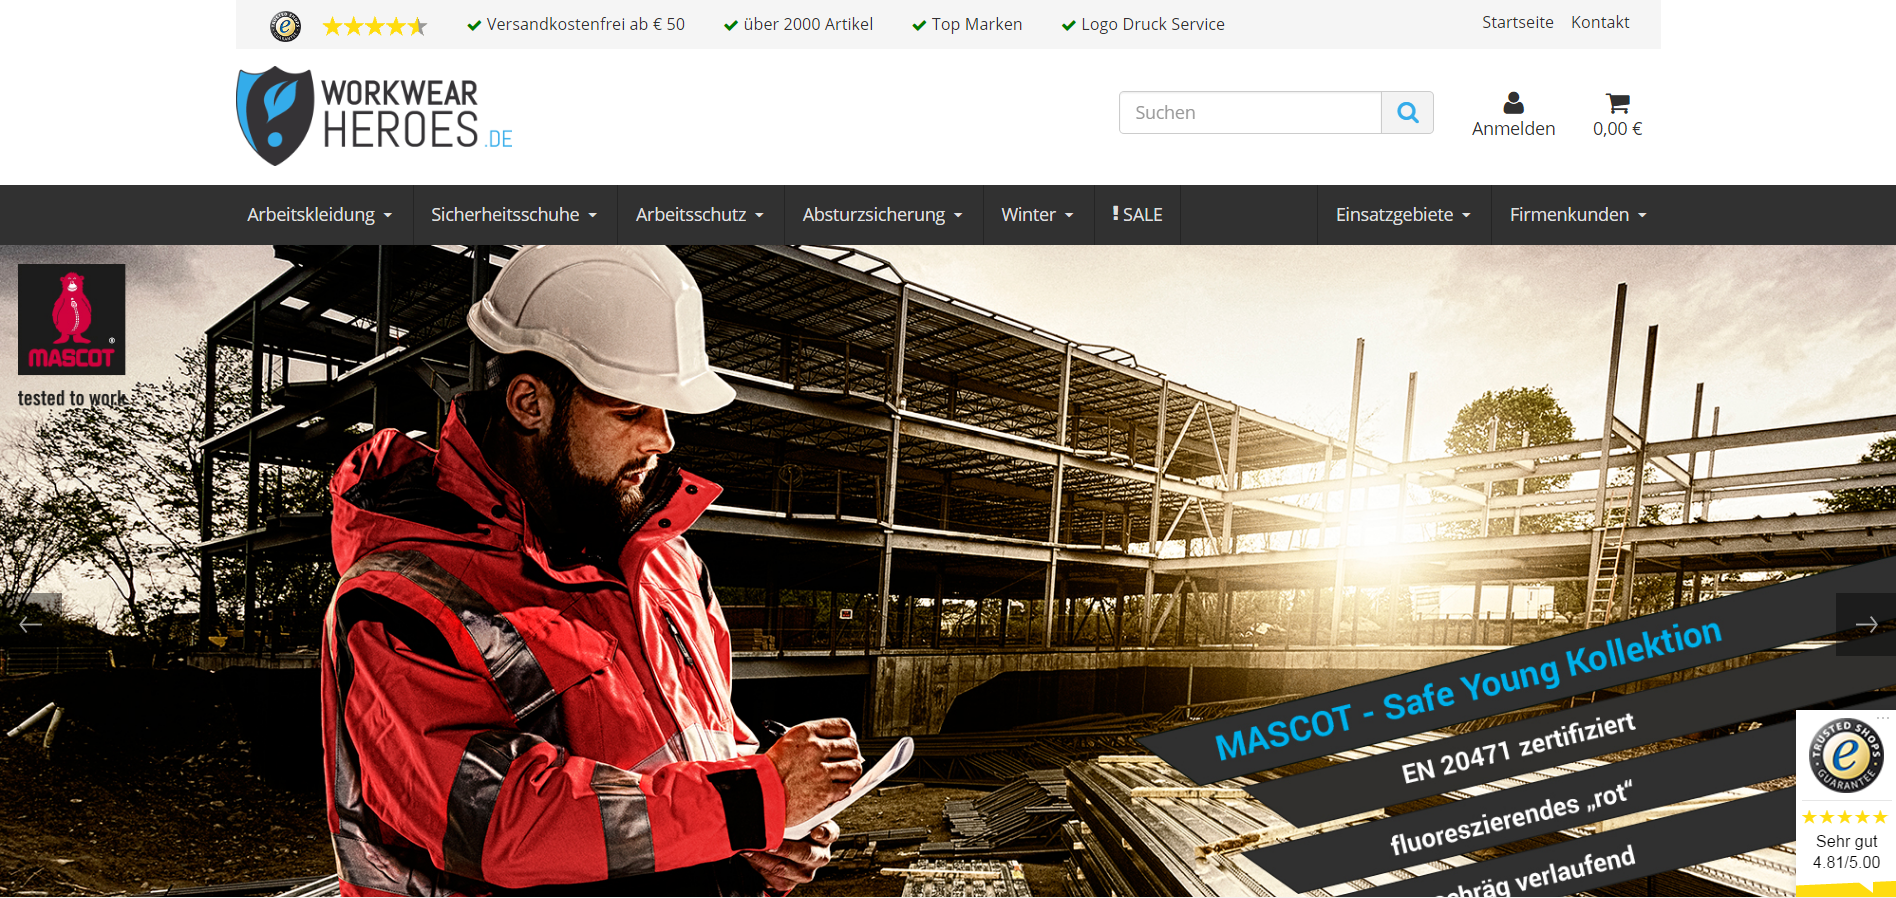 Webshop für workwear-heroes.de